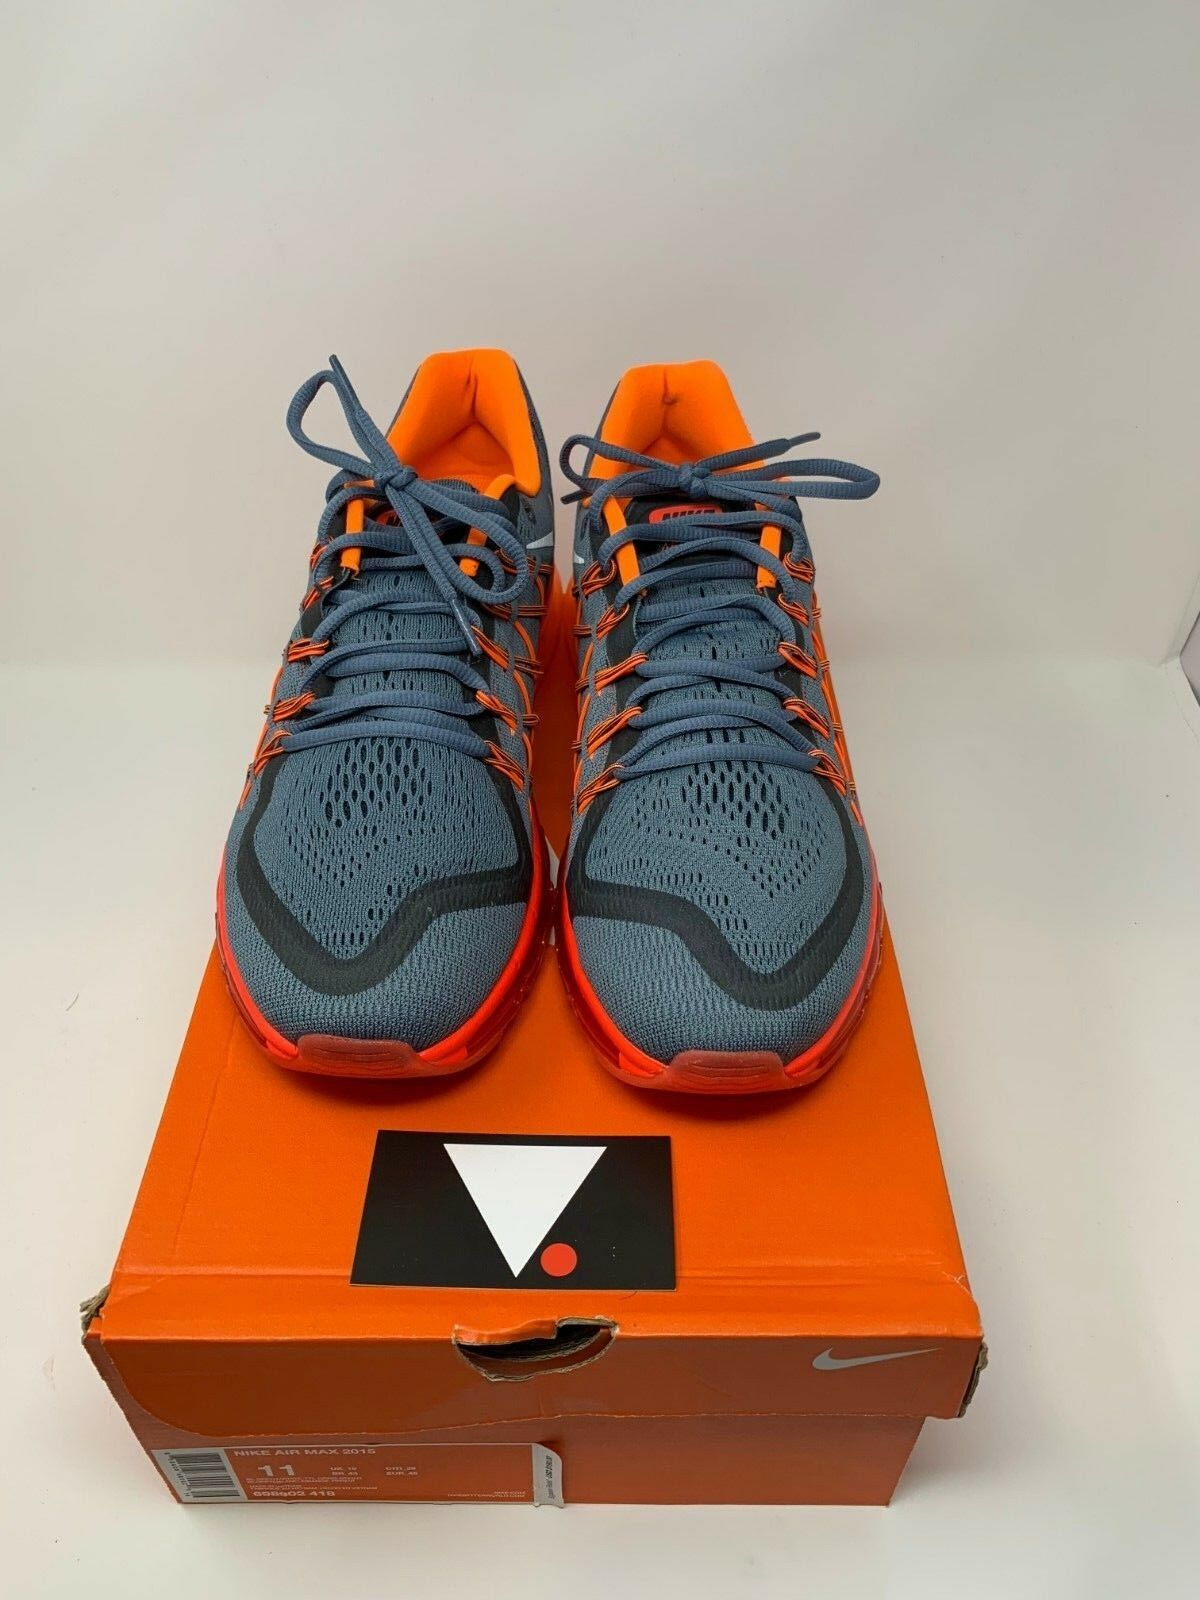 Nike air max 2015 graphit orange 698902 418 reagieren reagieren reagieren und pegasus dd7fd9